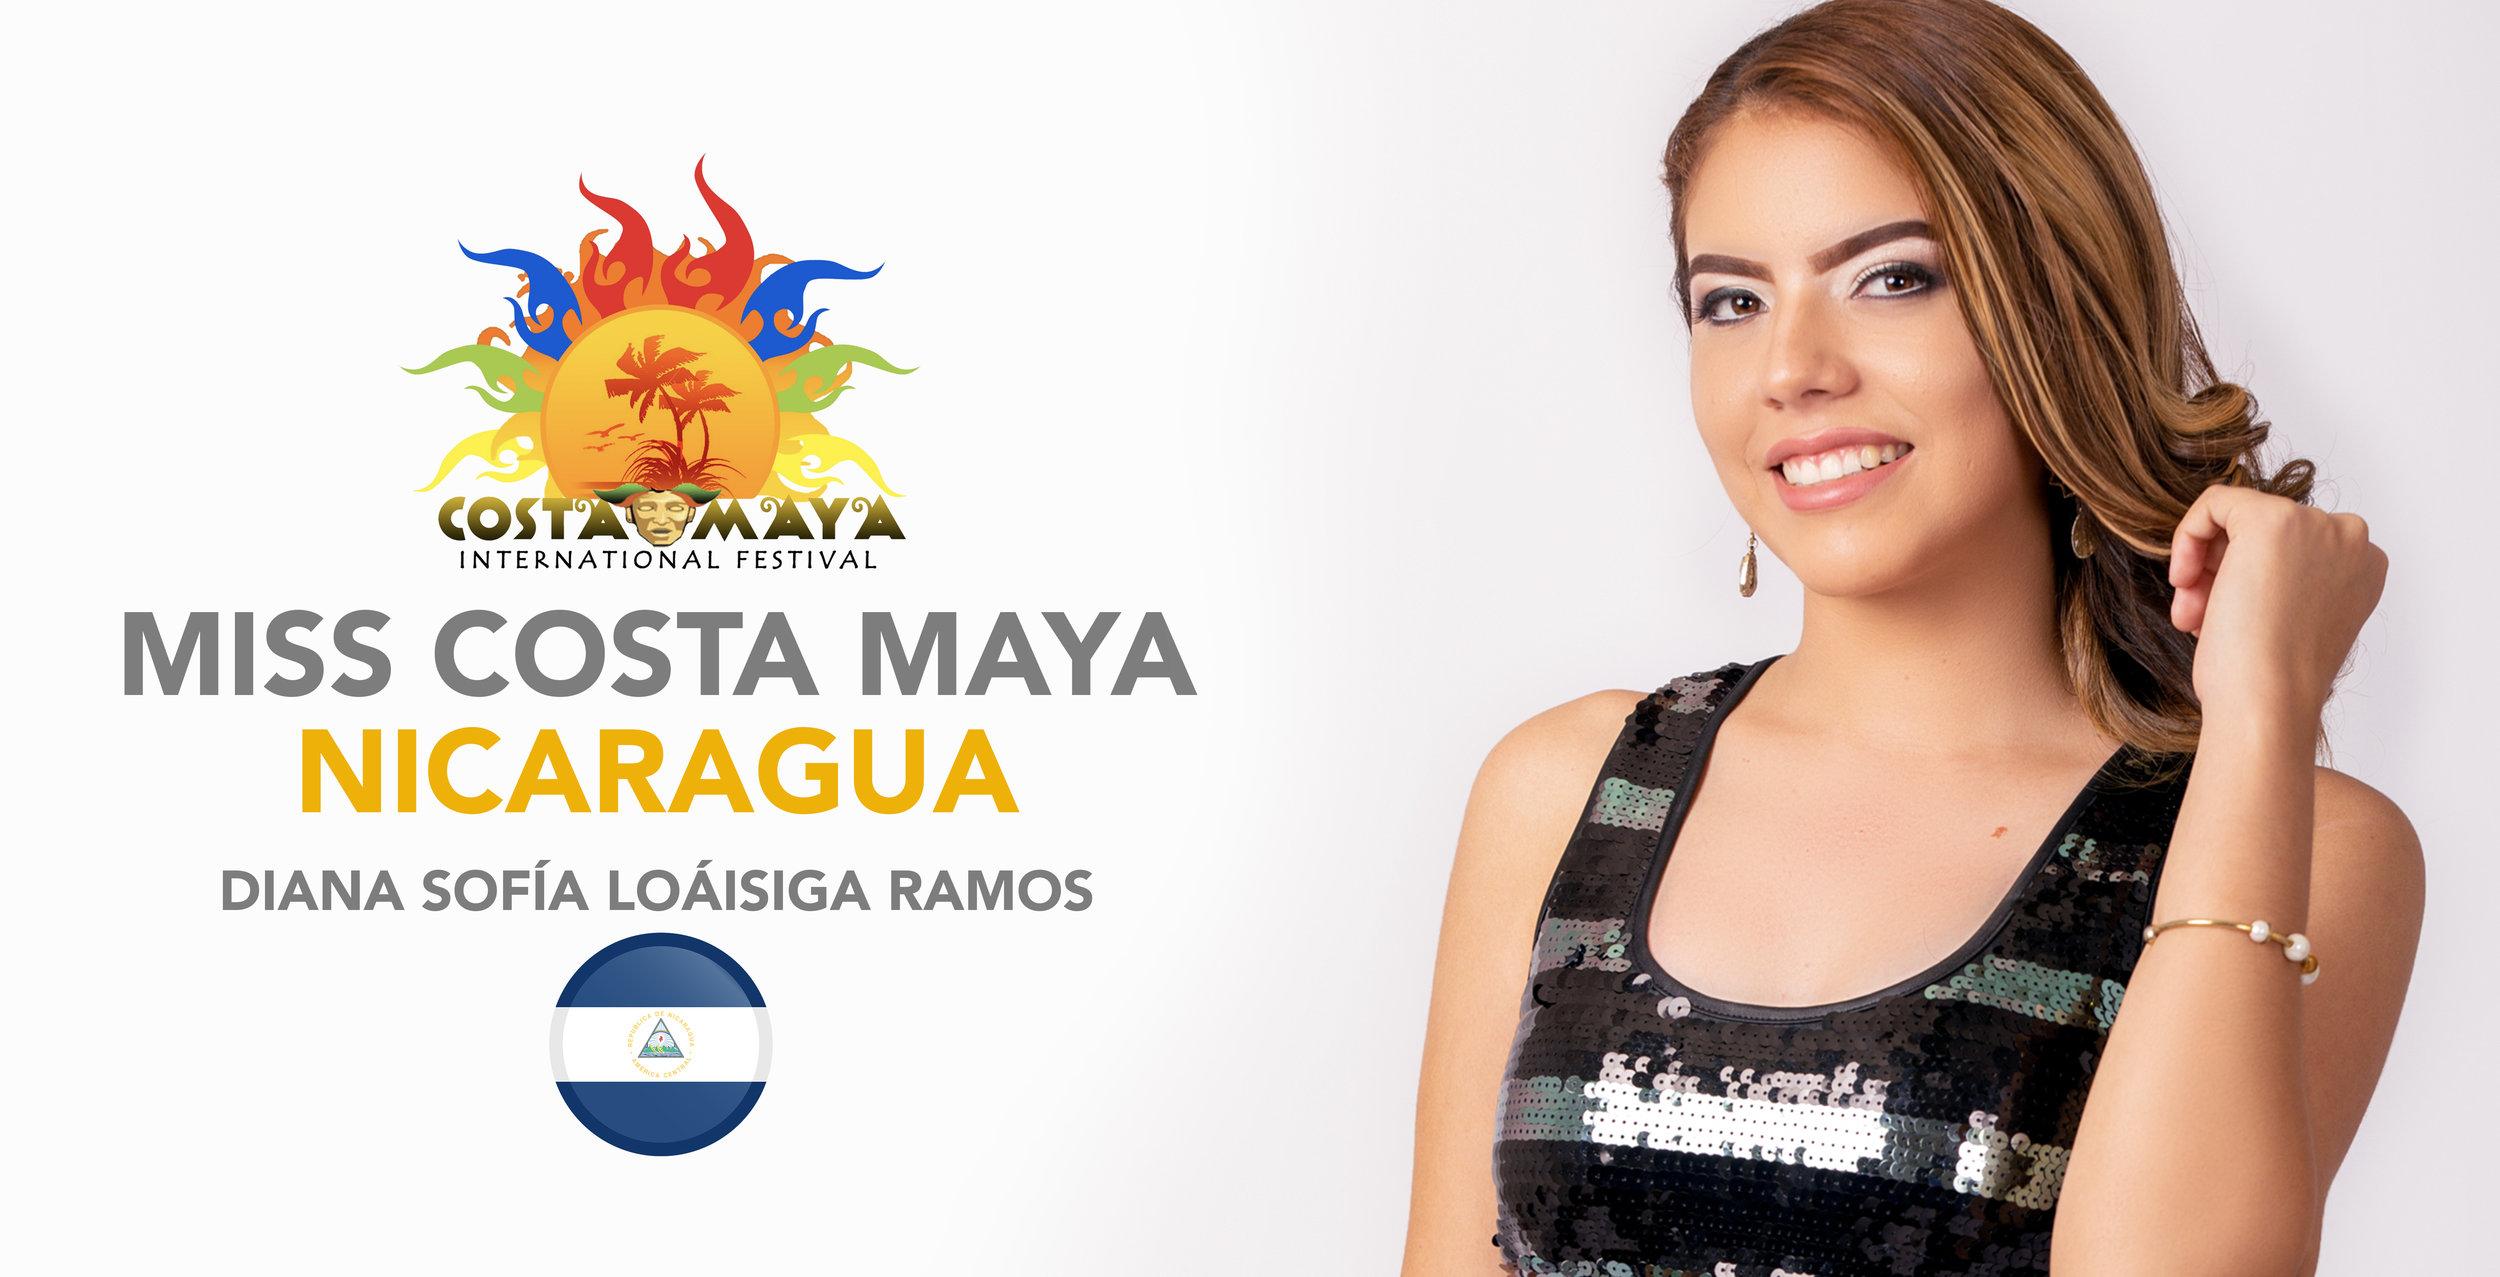 NICARAGUA COVER PAGE.jpg